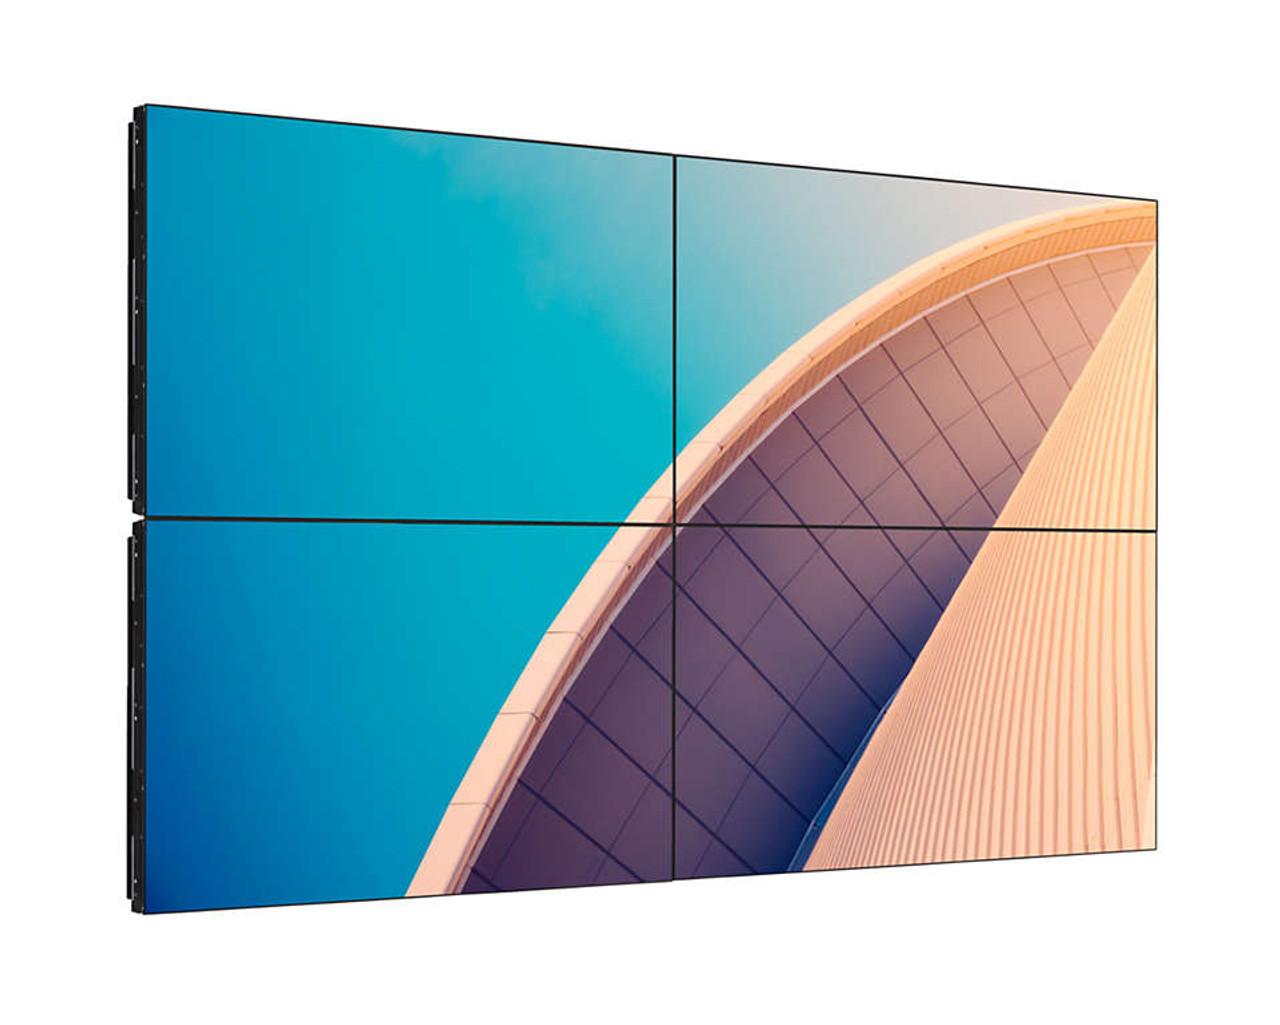 "Philips X-Line Full HD 500 Nits 3.5mm Bezel-to-Bezel Video Wall (49"", 55"")"